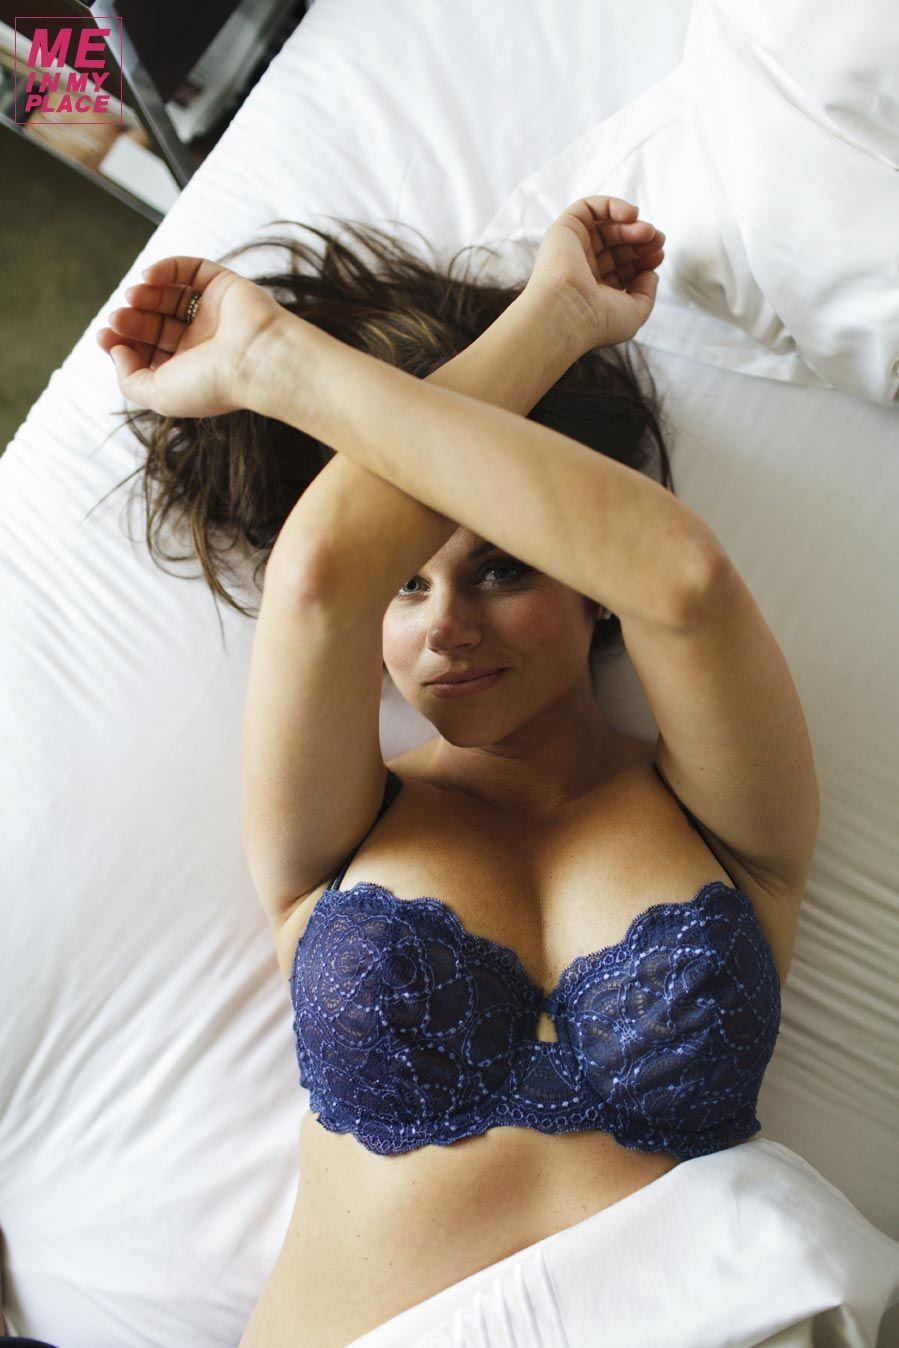 Selfie Tiffani-Amber Thiessen nudes (32 photo), Topless, Leaked, Boobs, swimsuit 2020